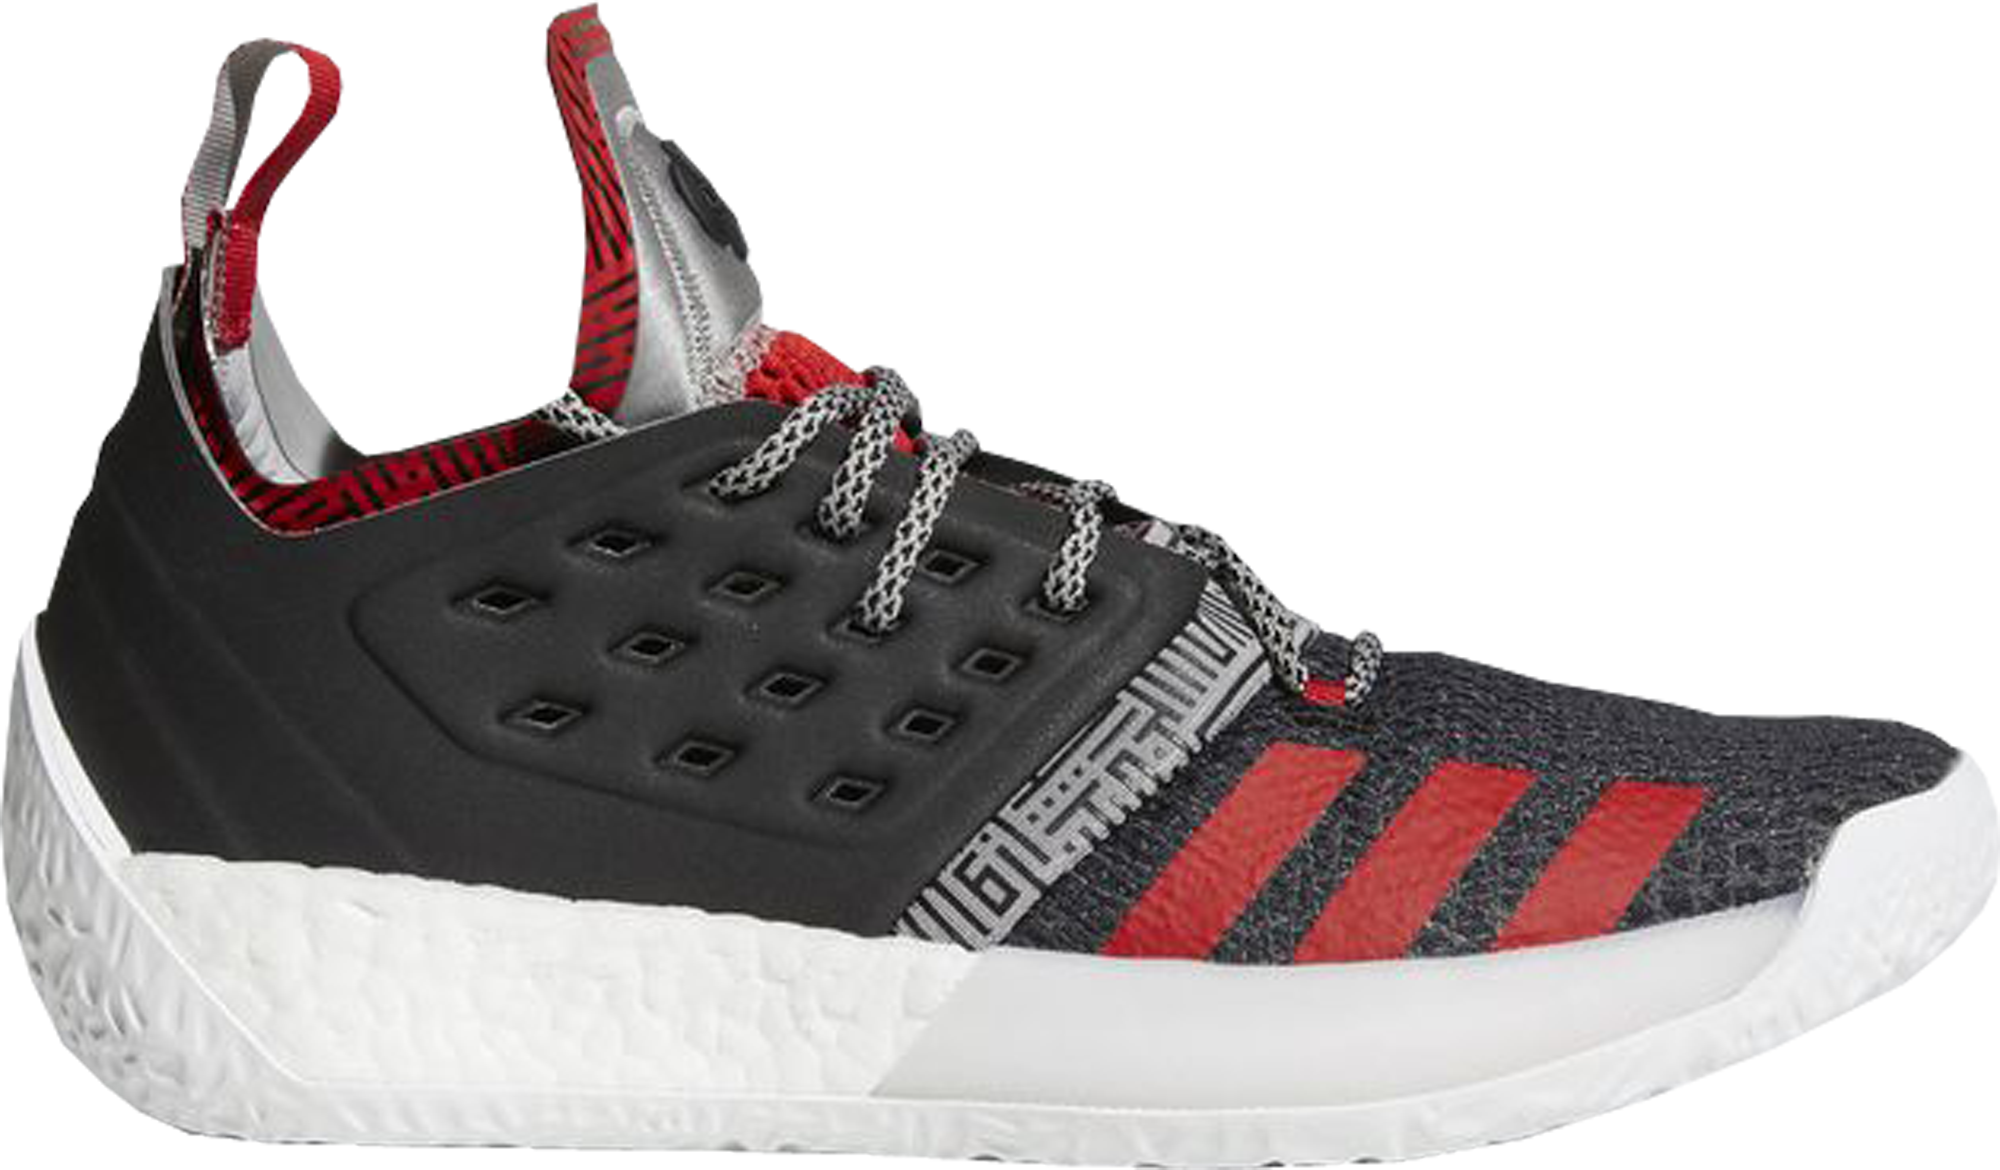 2415f515b7b2 Athletic Shoes Adidas James Harden Vol 2 Lift Off Black Scarlet grey Mens  sizes AH2123 Clothing